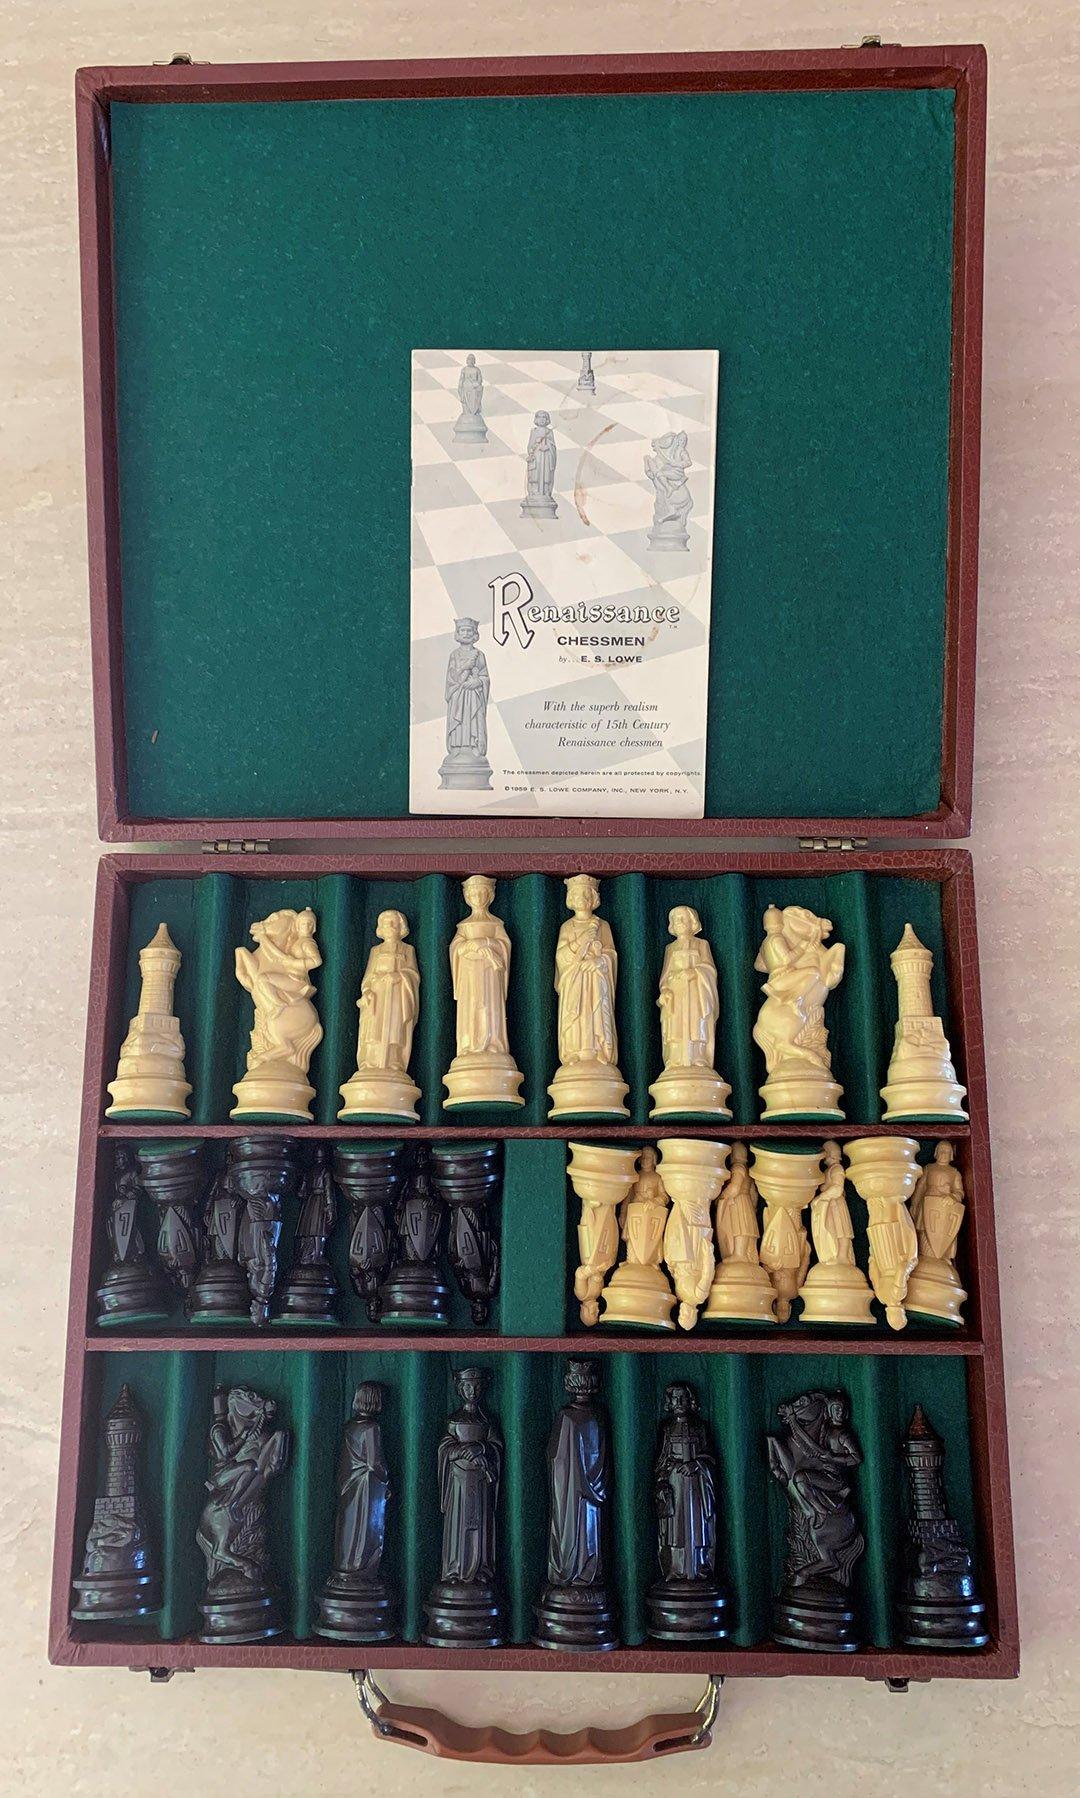 E. S. Lowe Renaissance Chessmen, Presentation Set